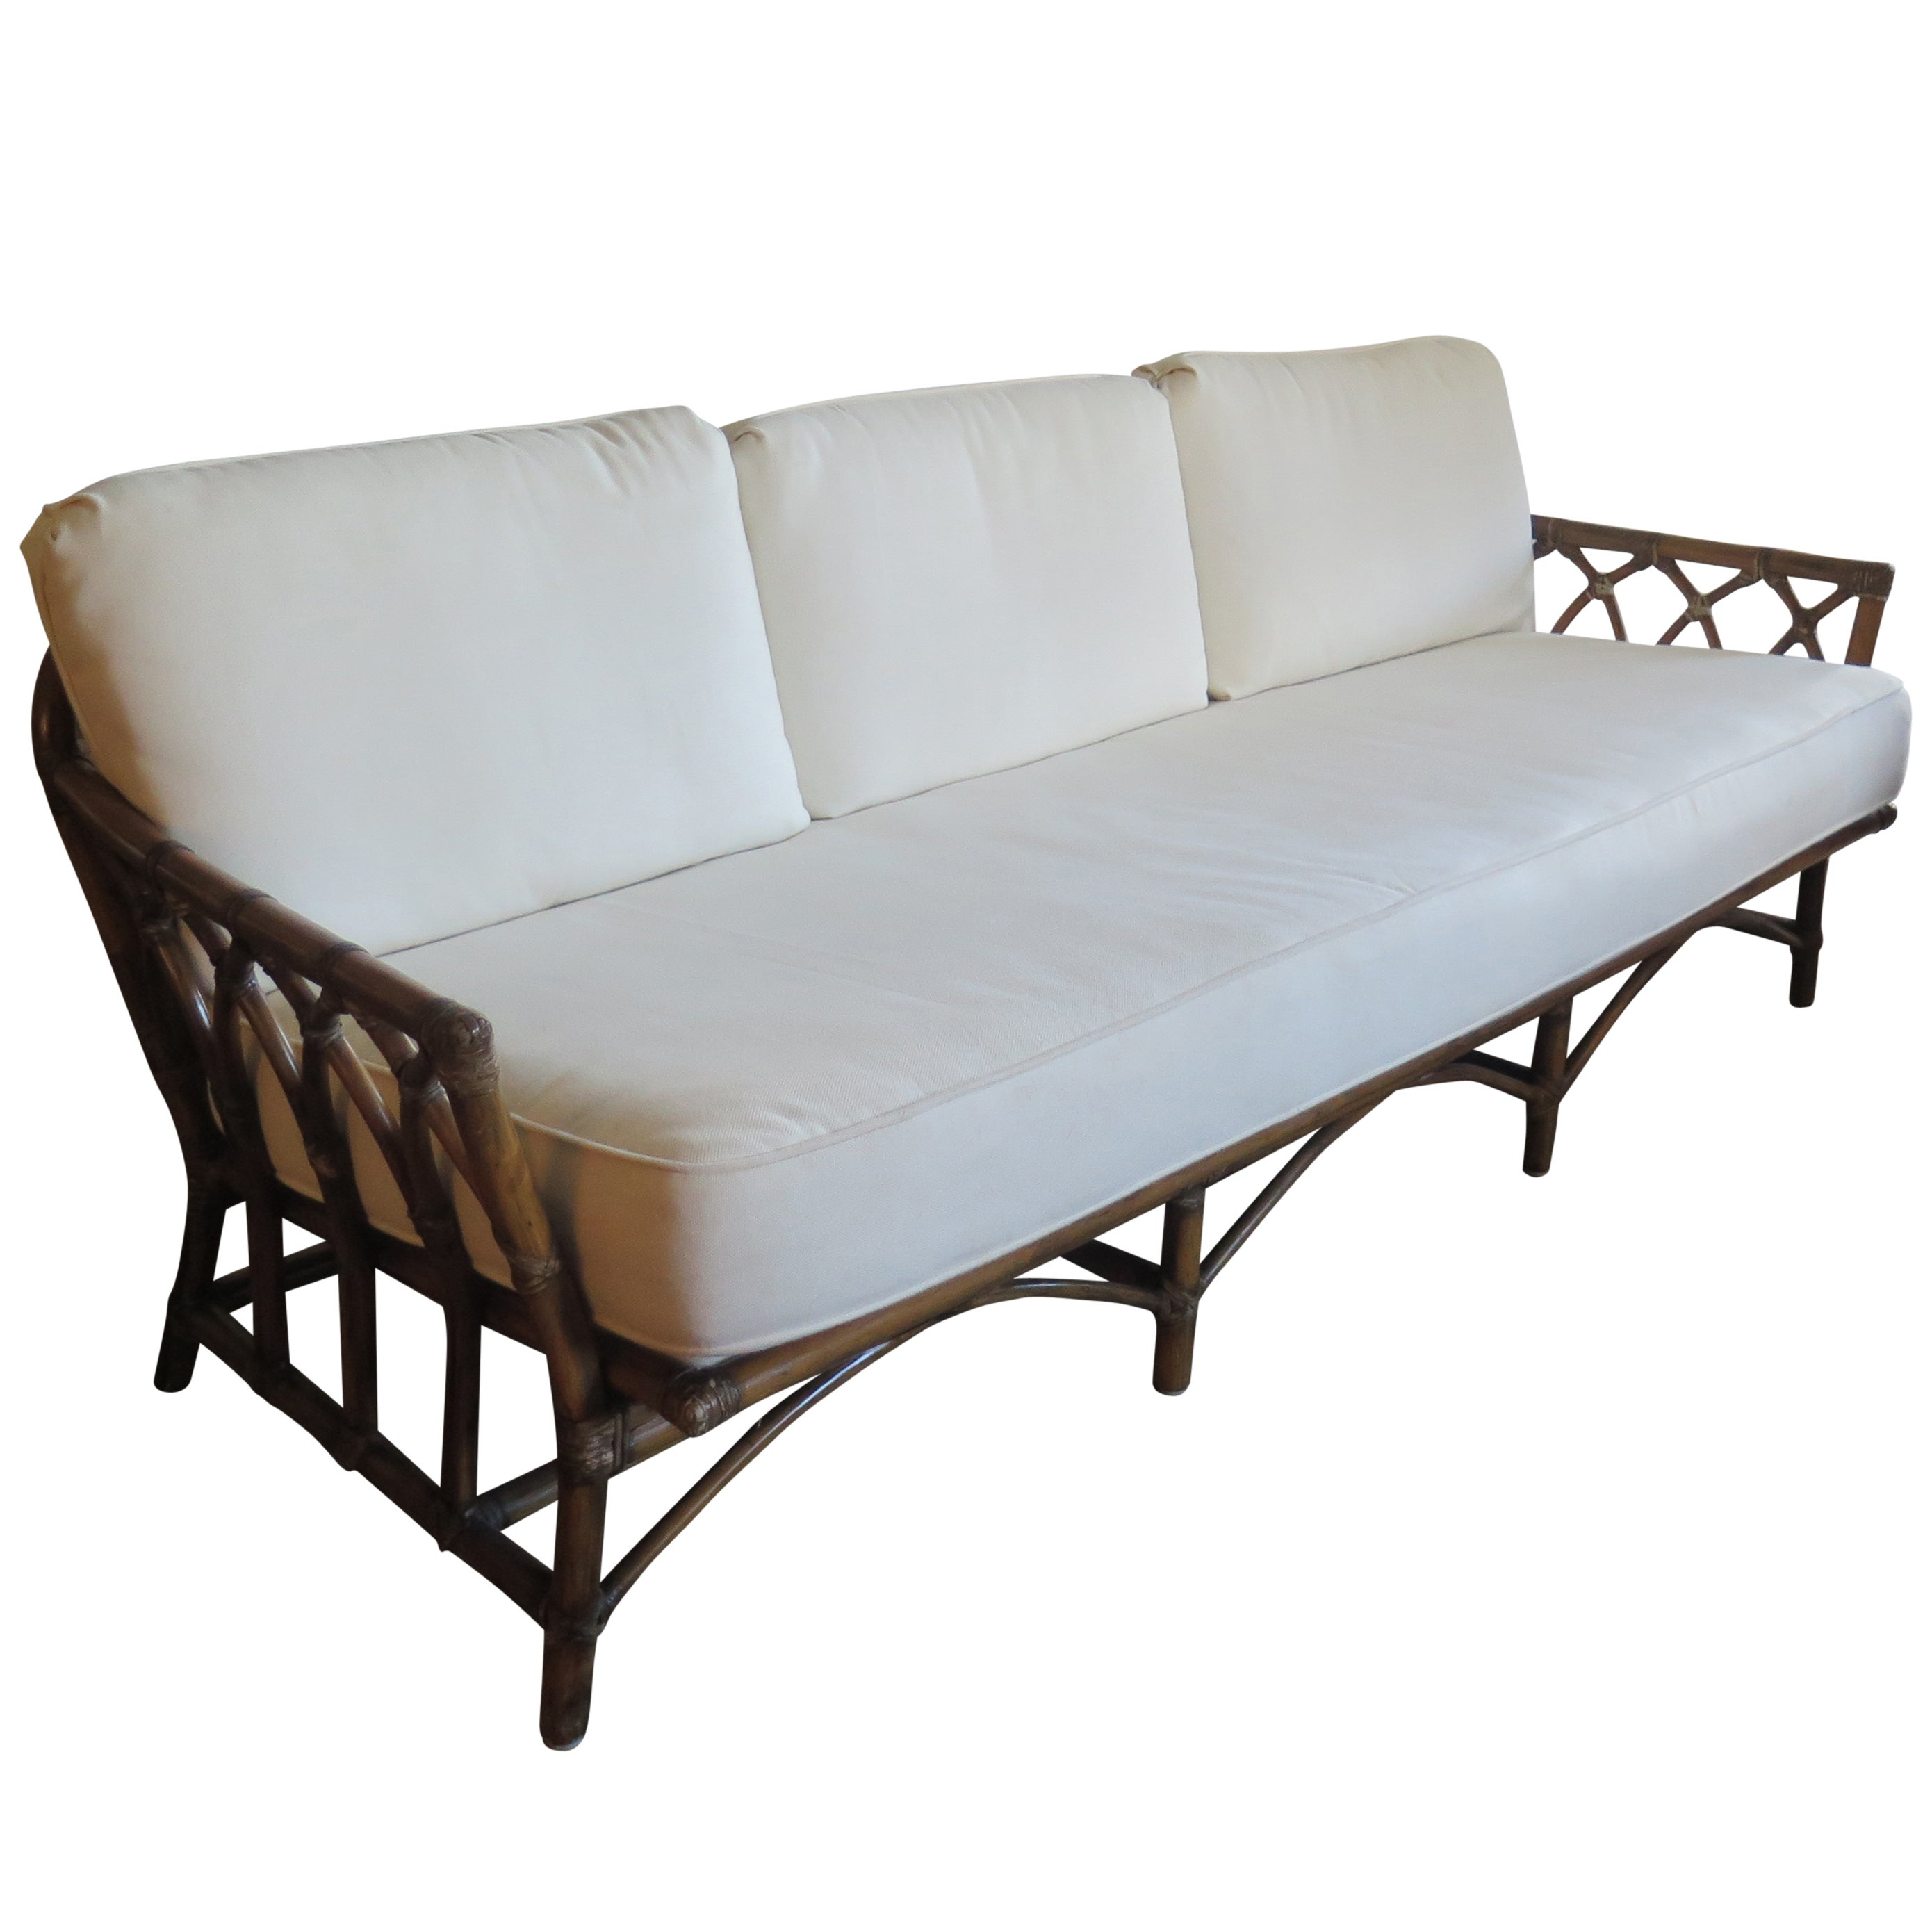 cushion atq bamboo l hospitality products fiji rattan edit loveseat w